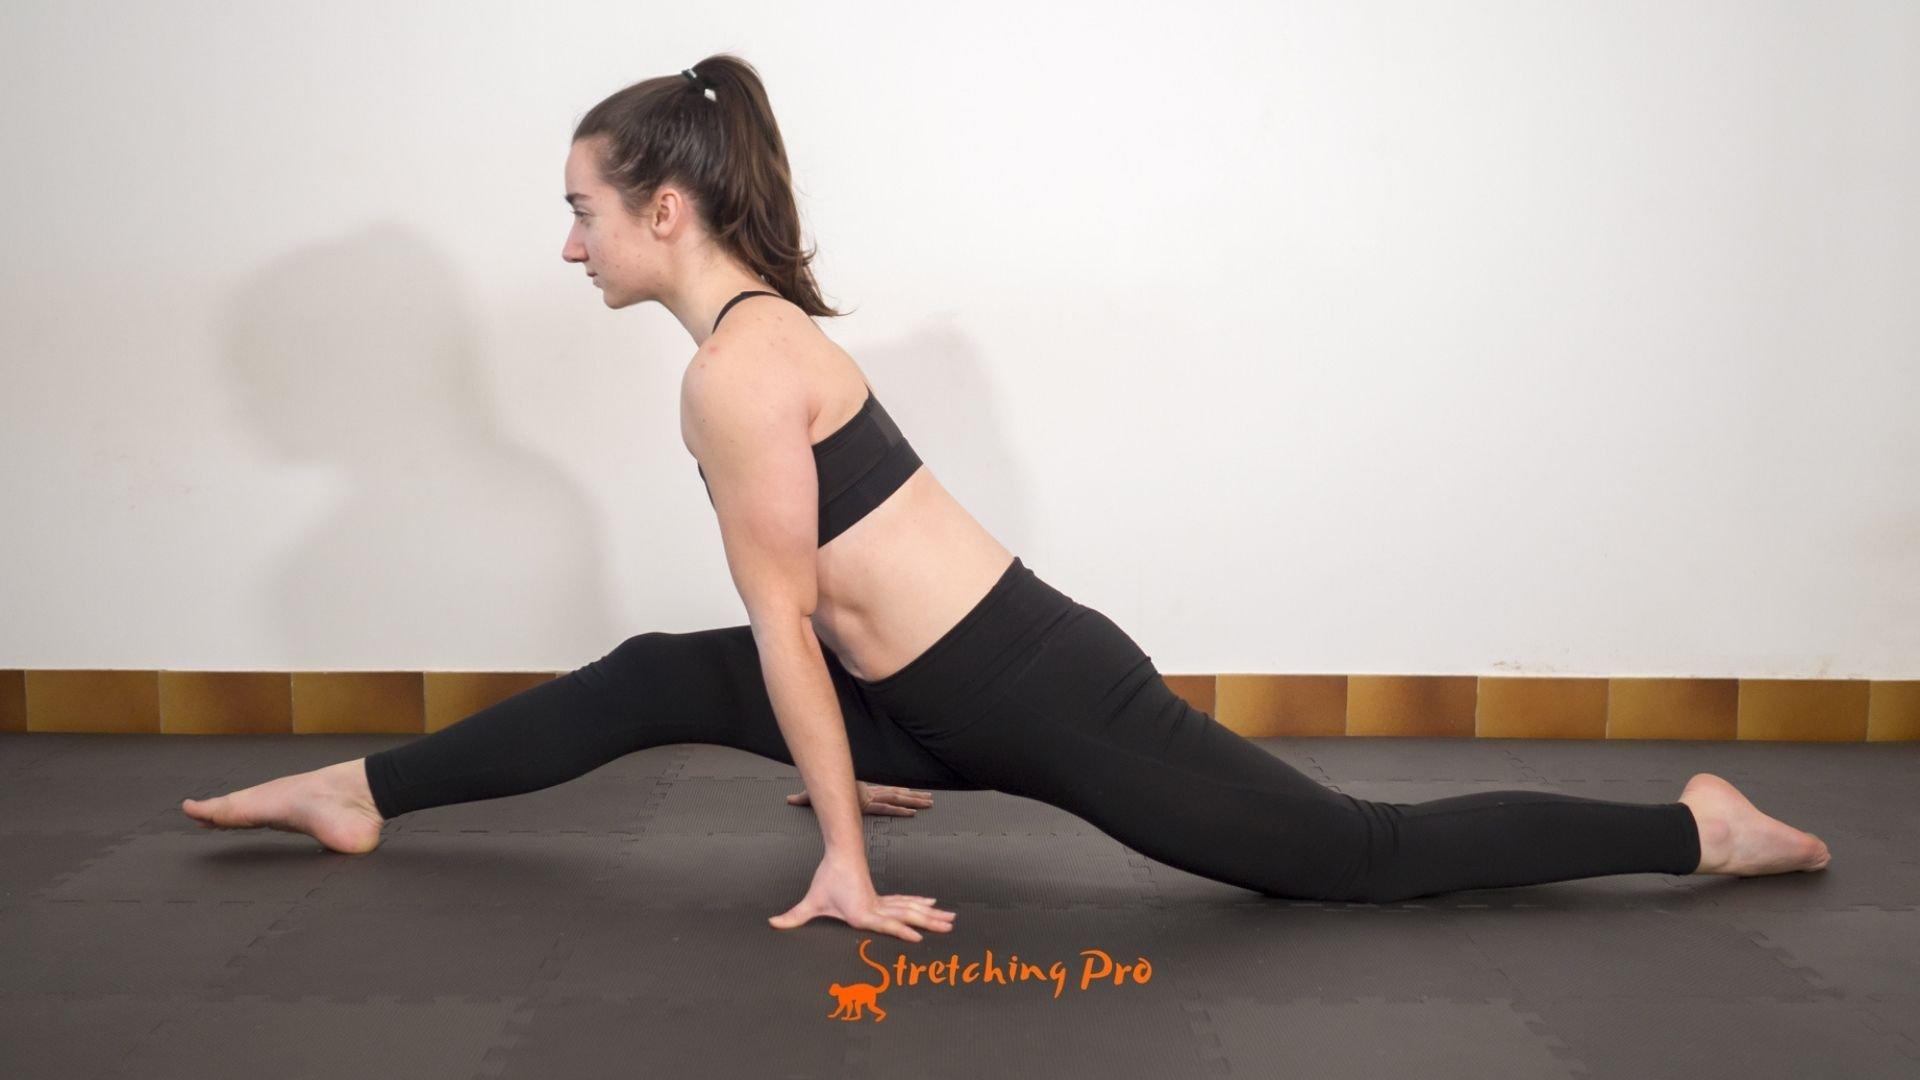 stretchingpro-comment-faire-grand-ecart